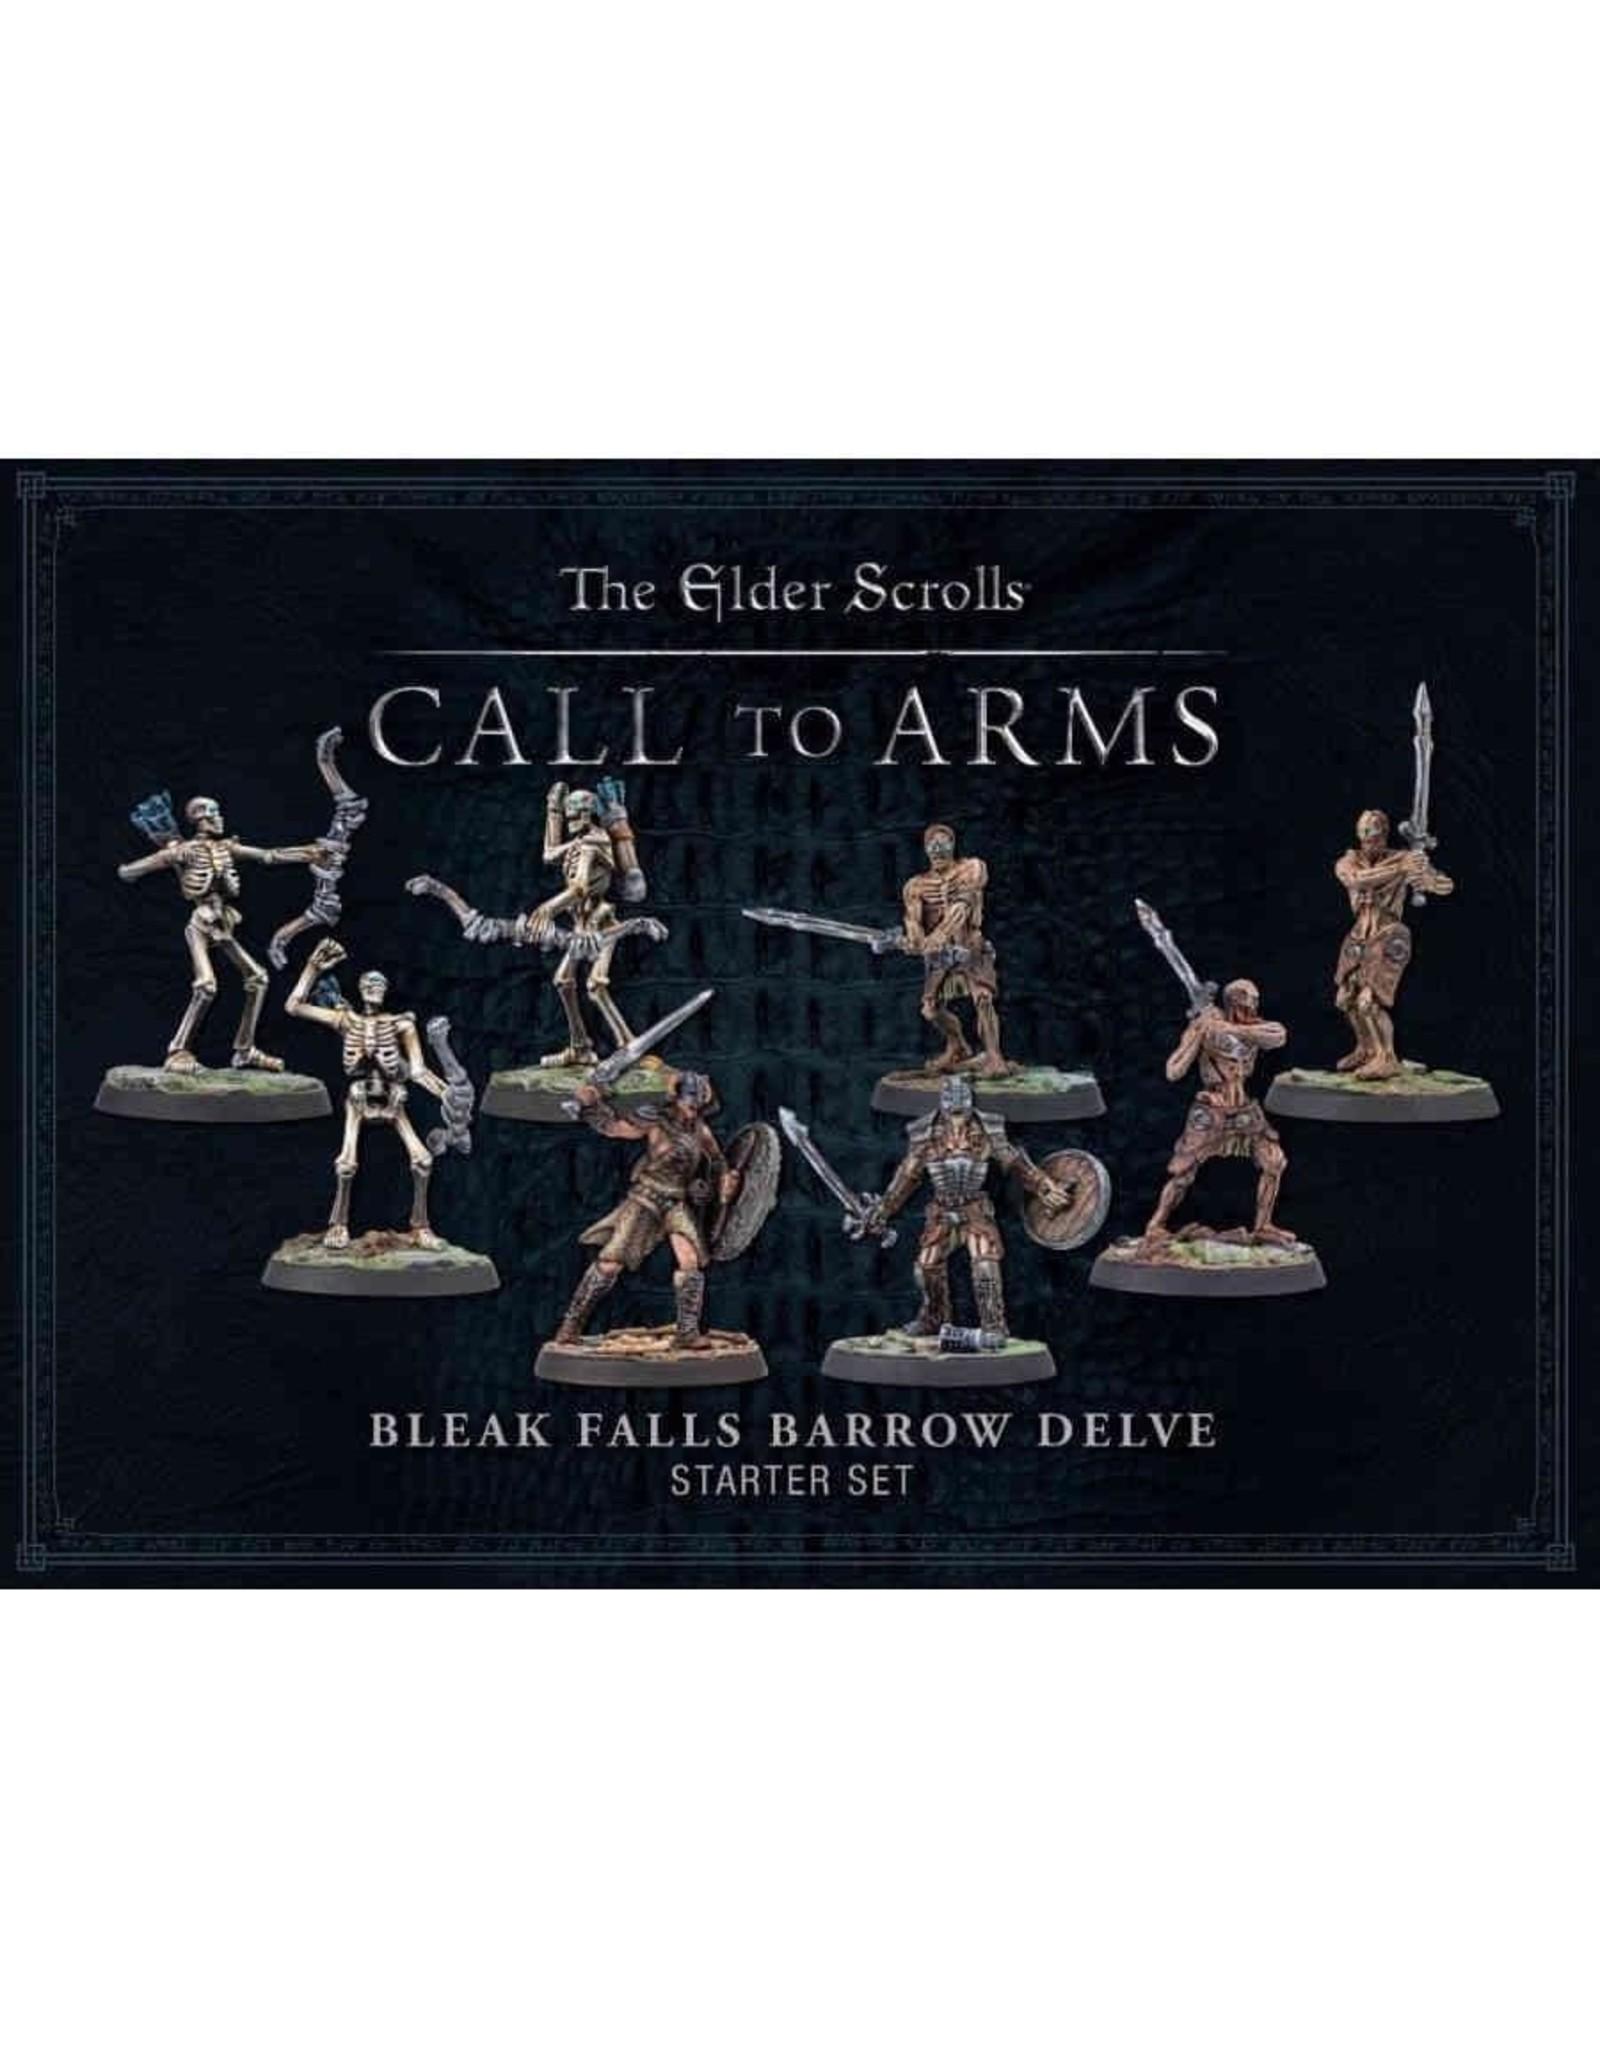 The Elder Scrolls A Call to Arms Bleak Falls Barrow Delve Set